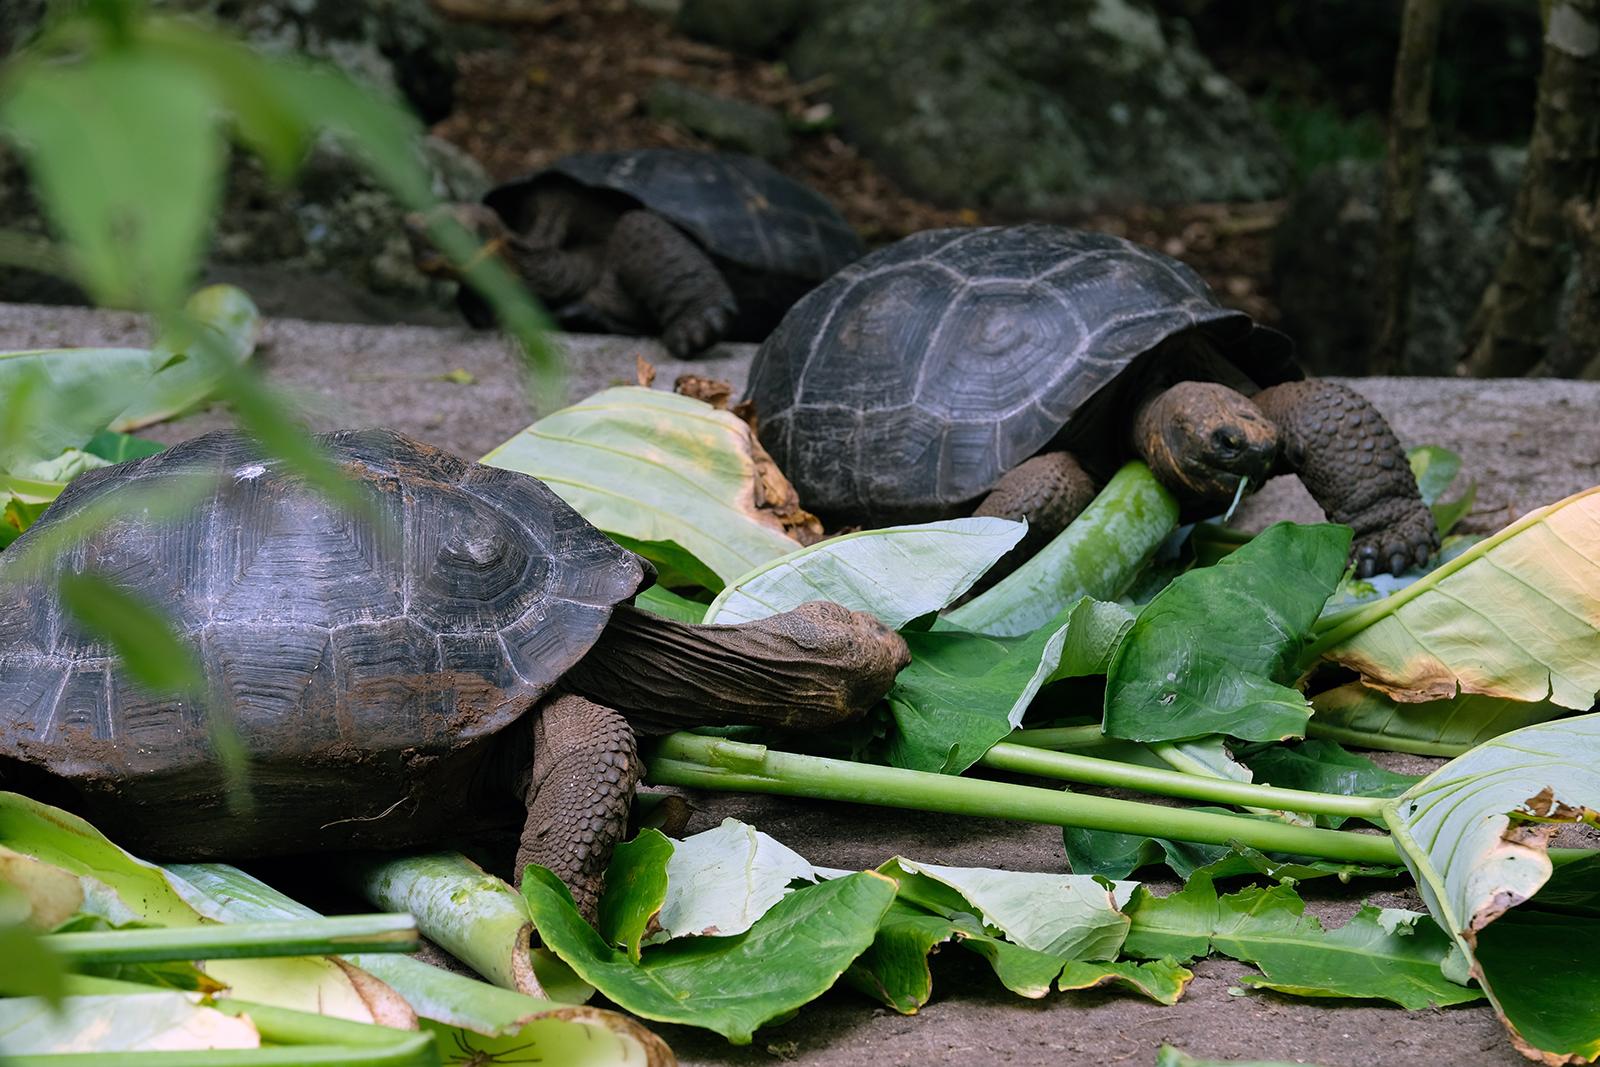 Criadero de tortugas en Isla Floreana